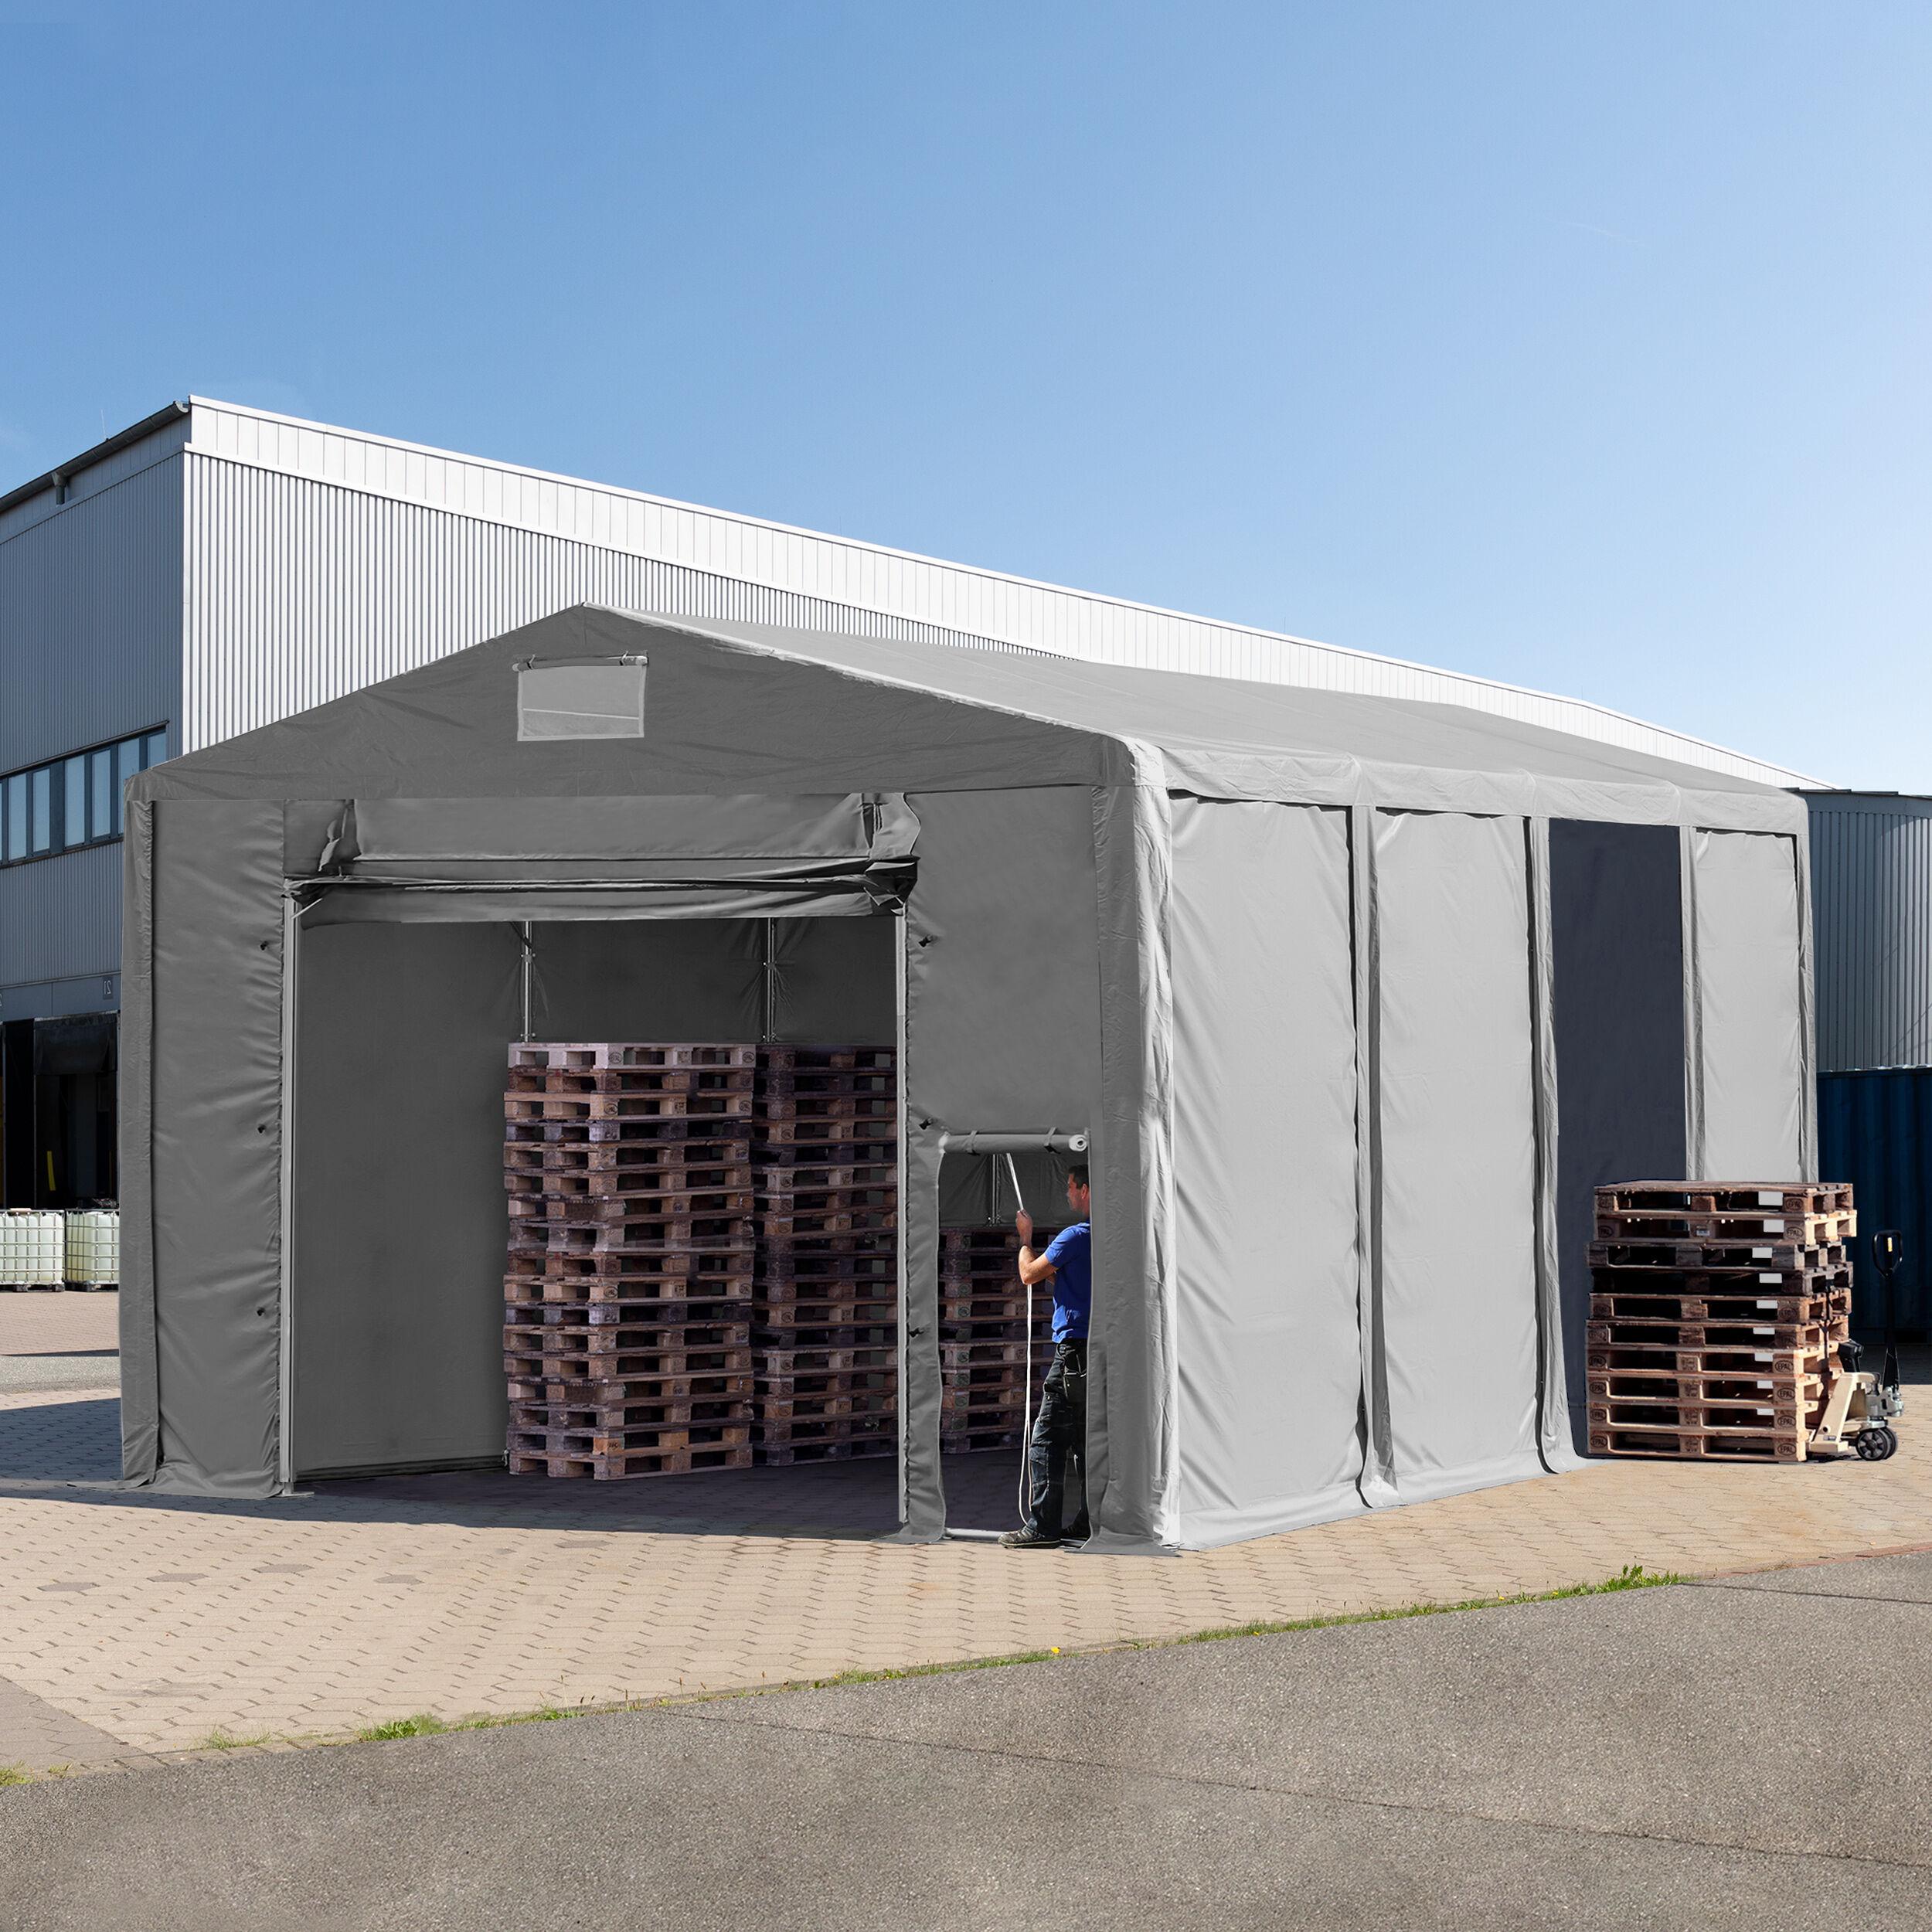 TOOLPORT Storage Tent 8x8m PVC 550 g/m² grey waterproof